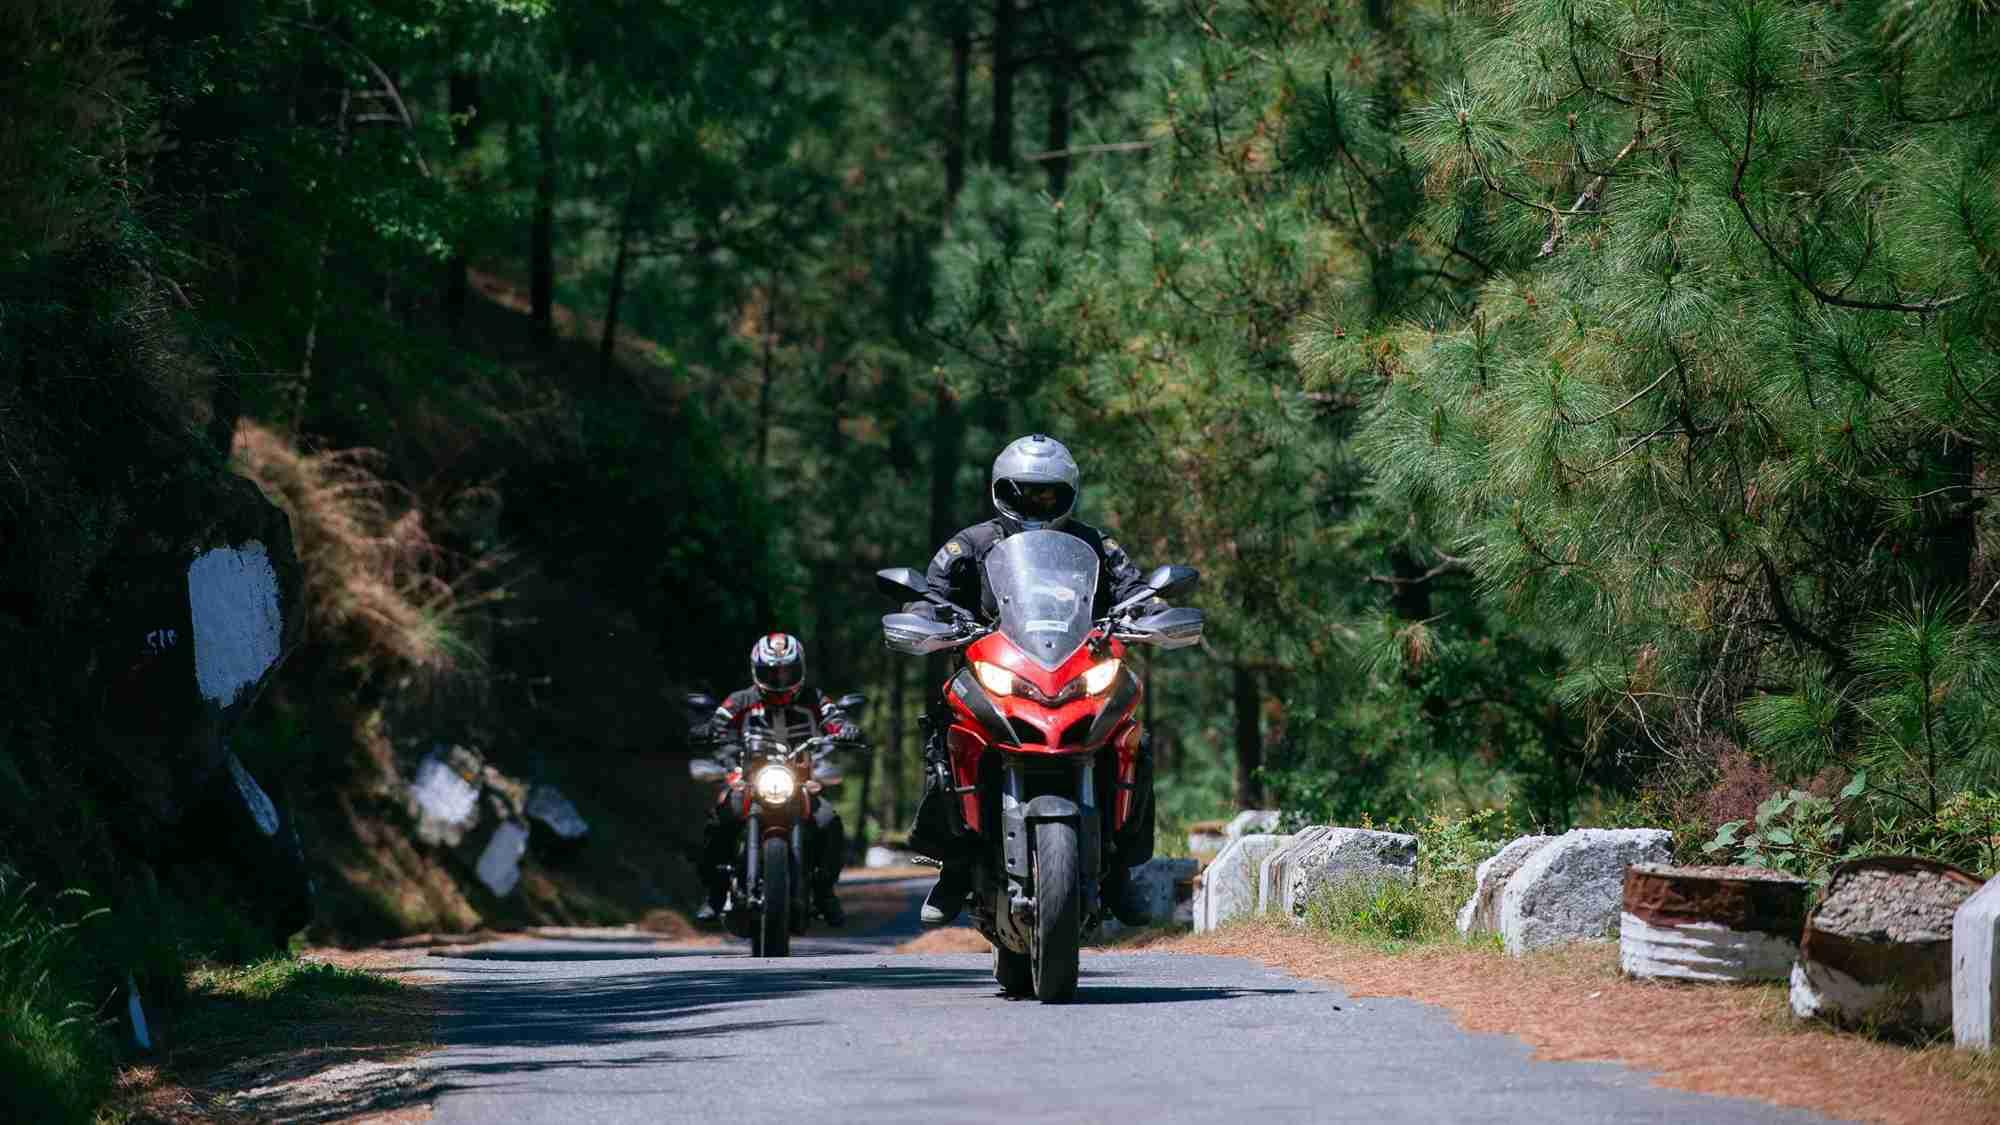 Ducati Dream Tour India Himachal Pradesh